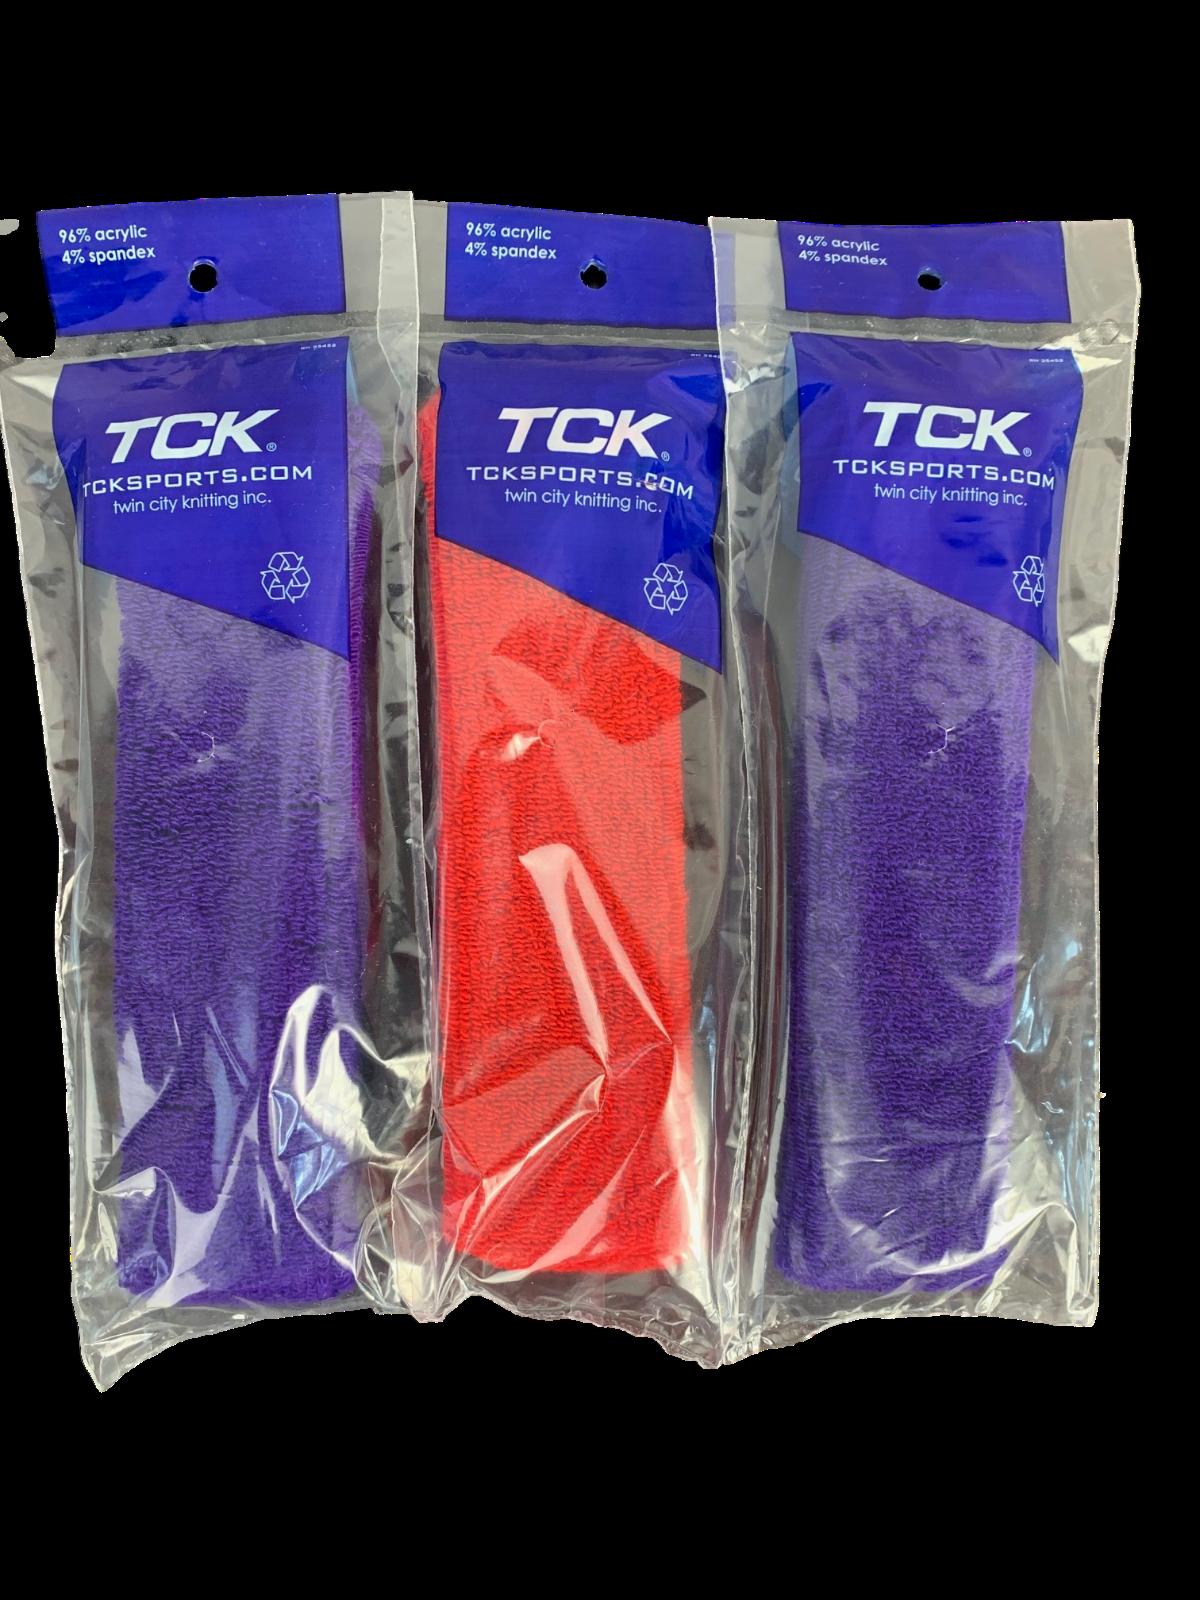 TCK Sports Headband Sweatband 3 Pack New In Package 2 Purple